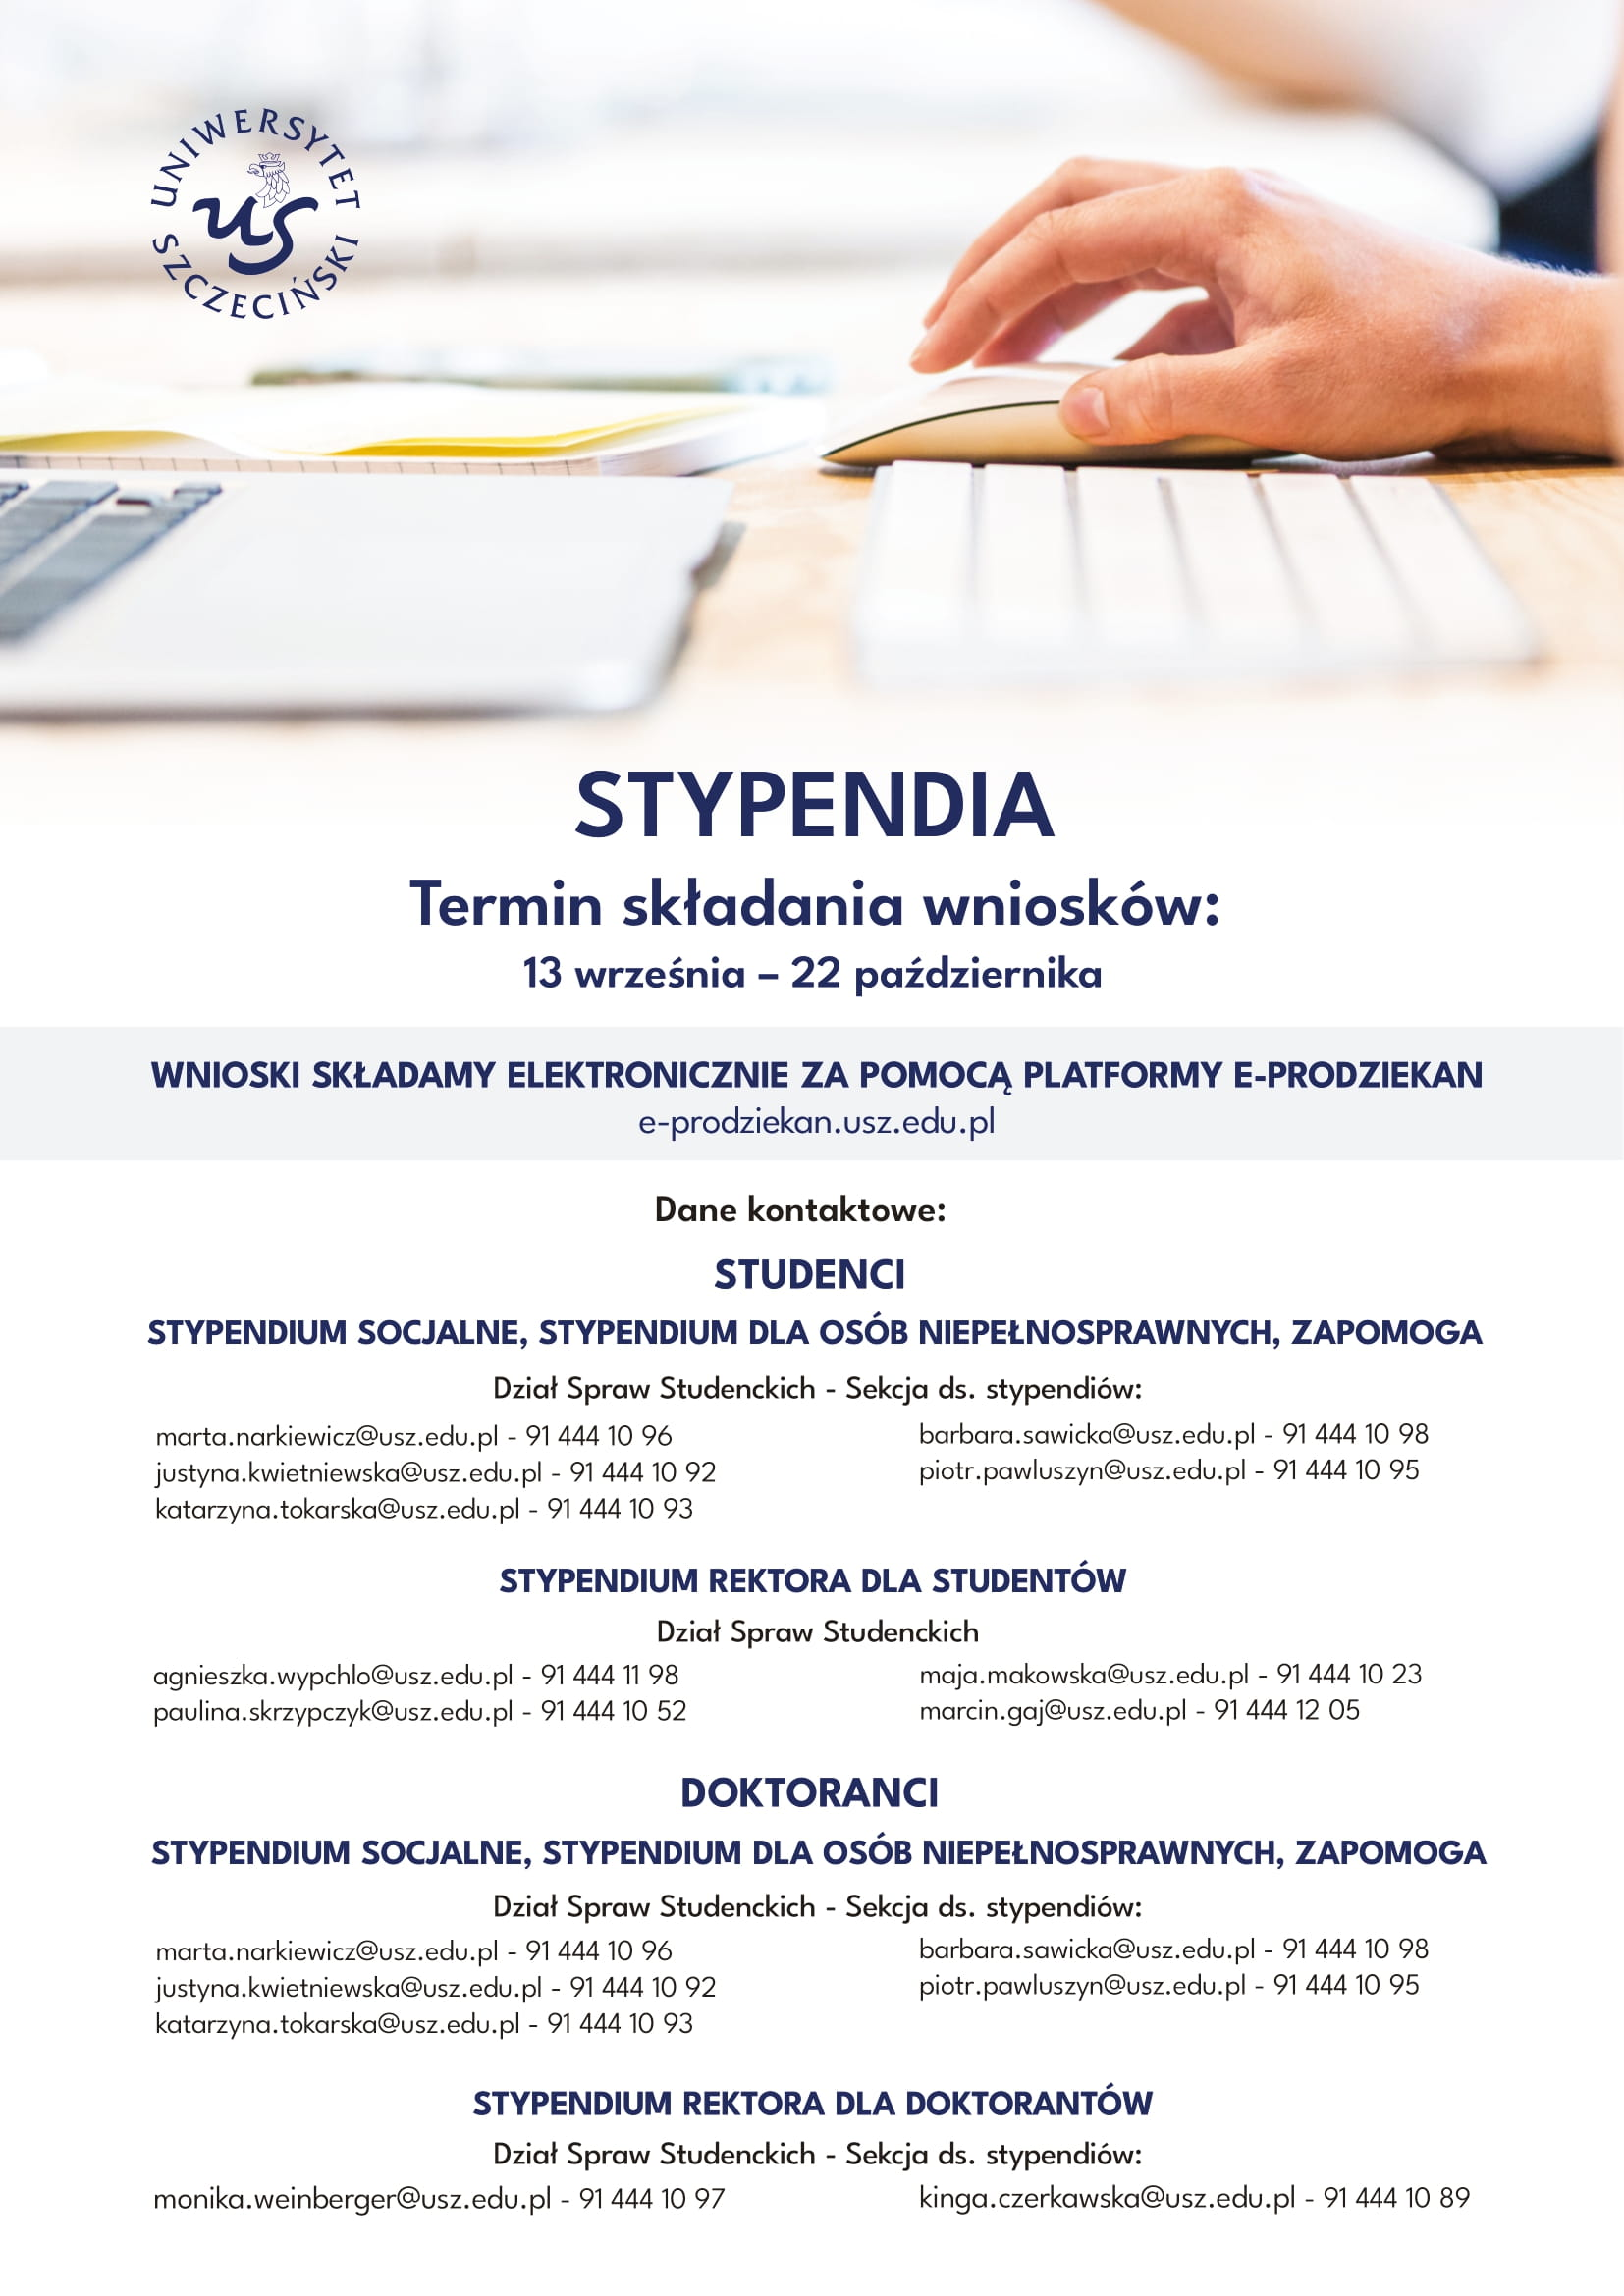 https://wpia.usz.edu.pl/wp-content/uploads/plakat_stypendia-1.jpg